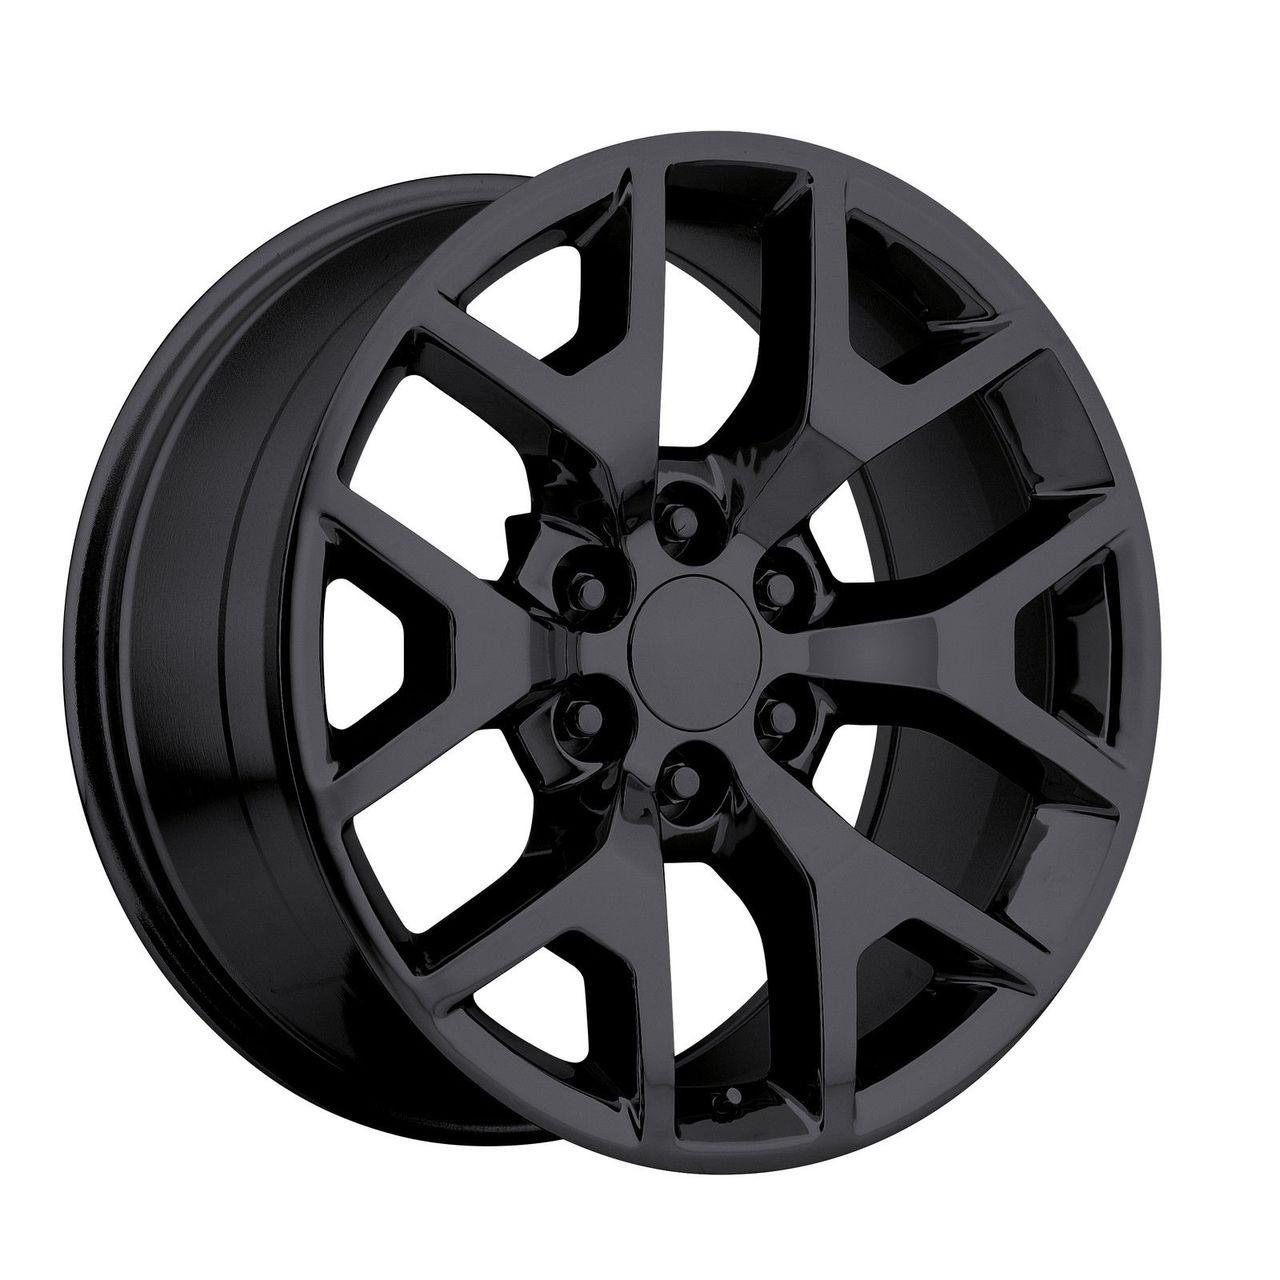 20 Quot 2014 Gmc Sierra Chevy 1500 Silverado Replica Wheels